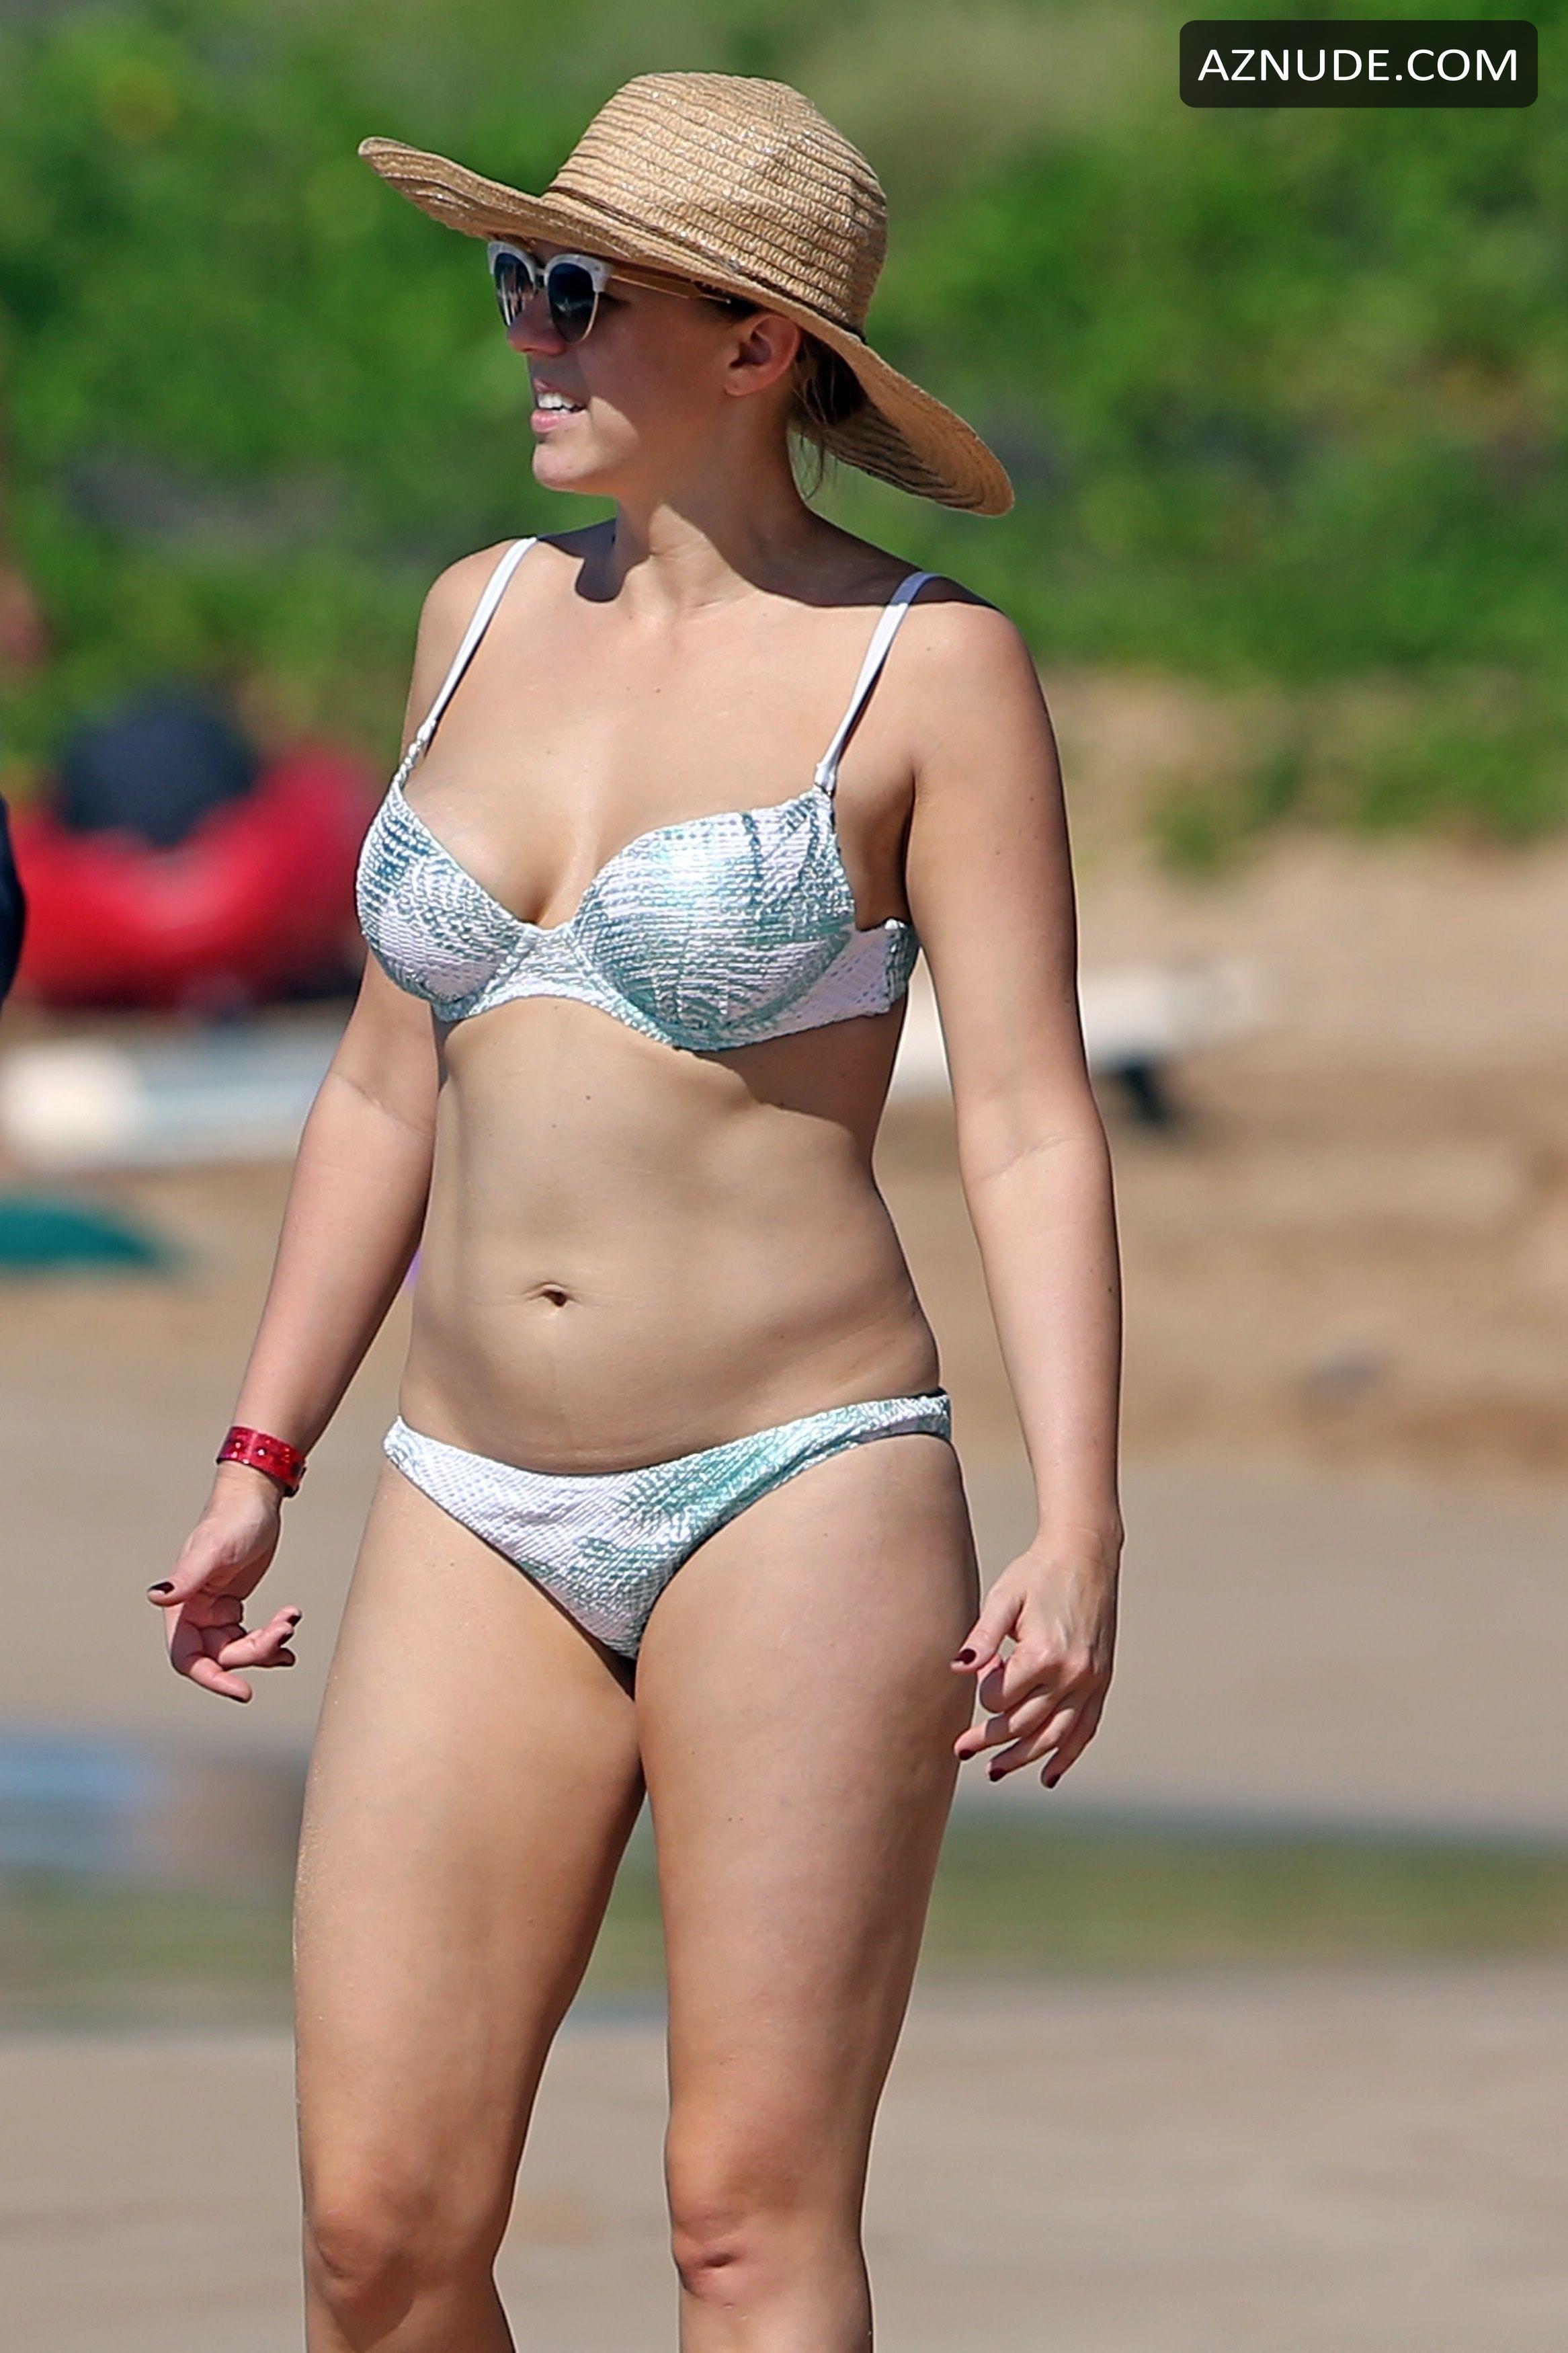 Sweetin topless jodie Latest Nude,